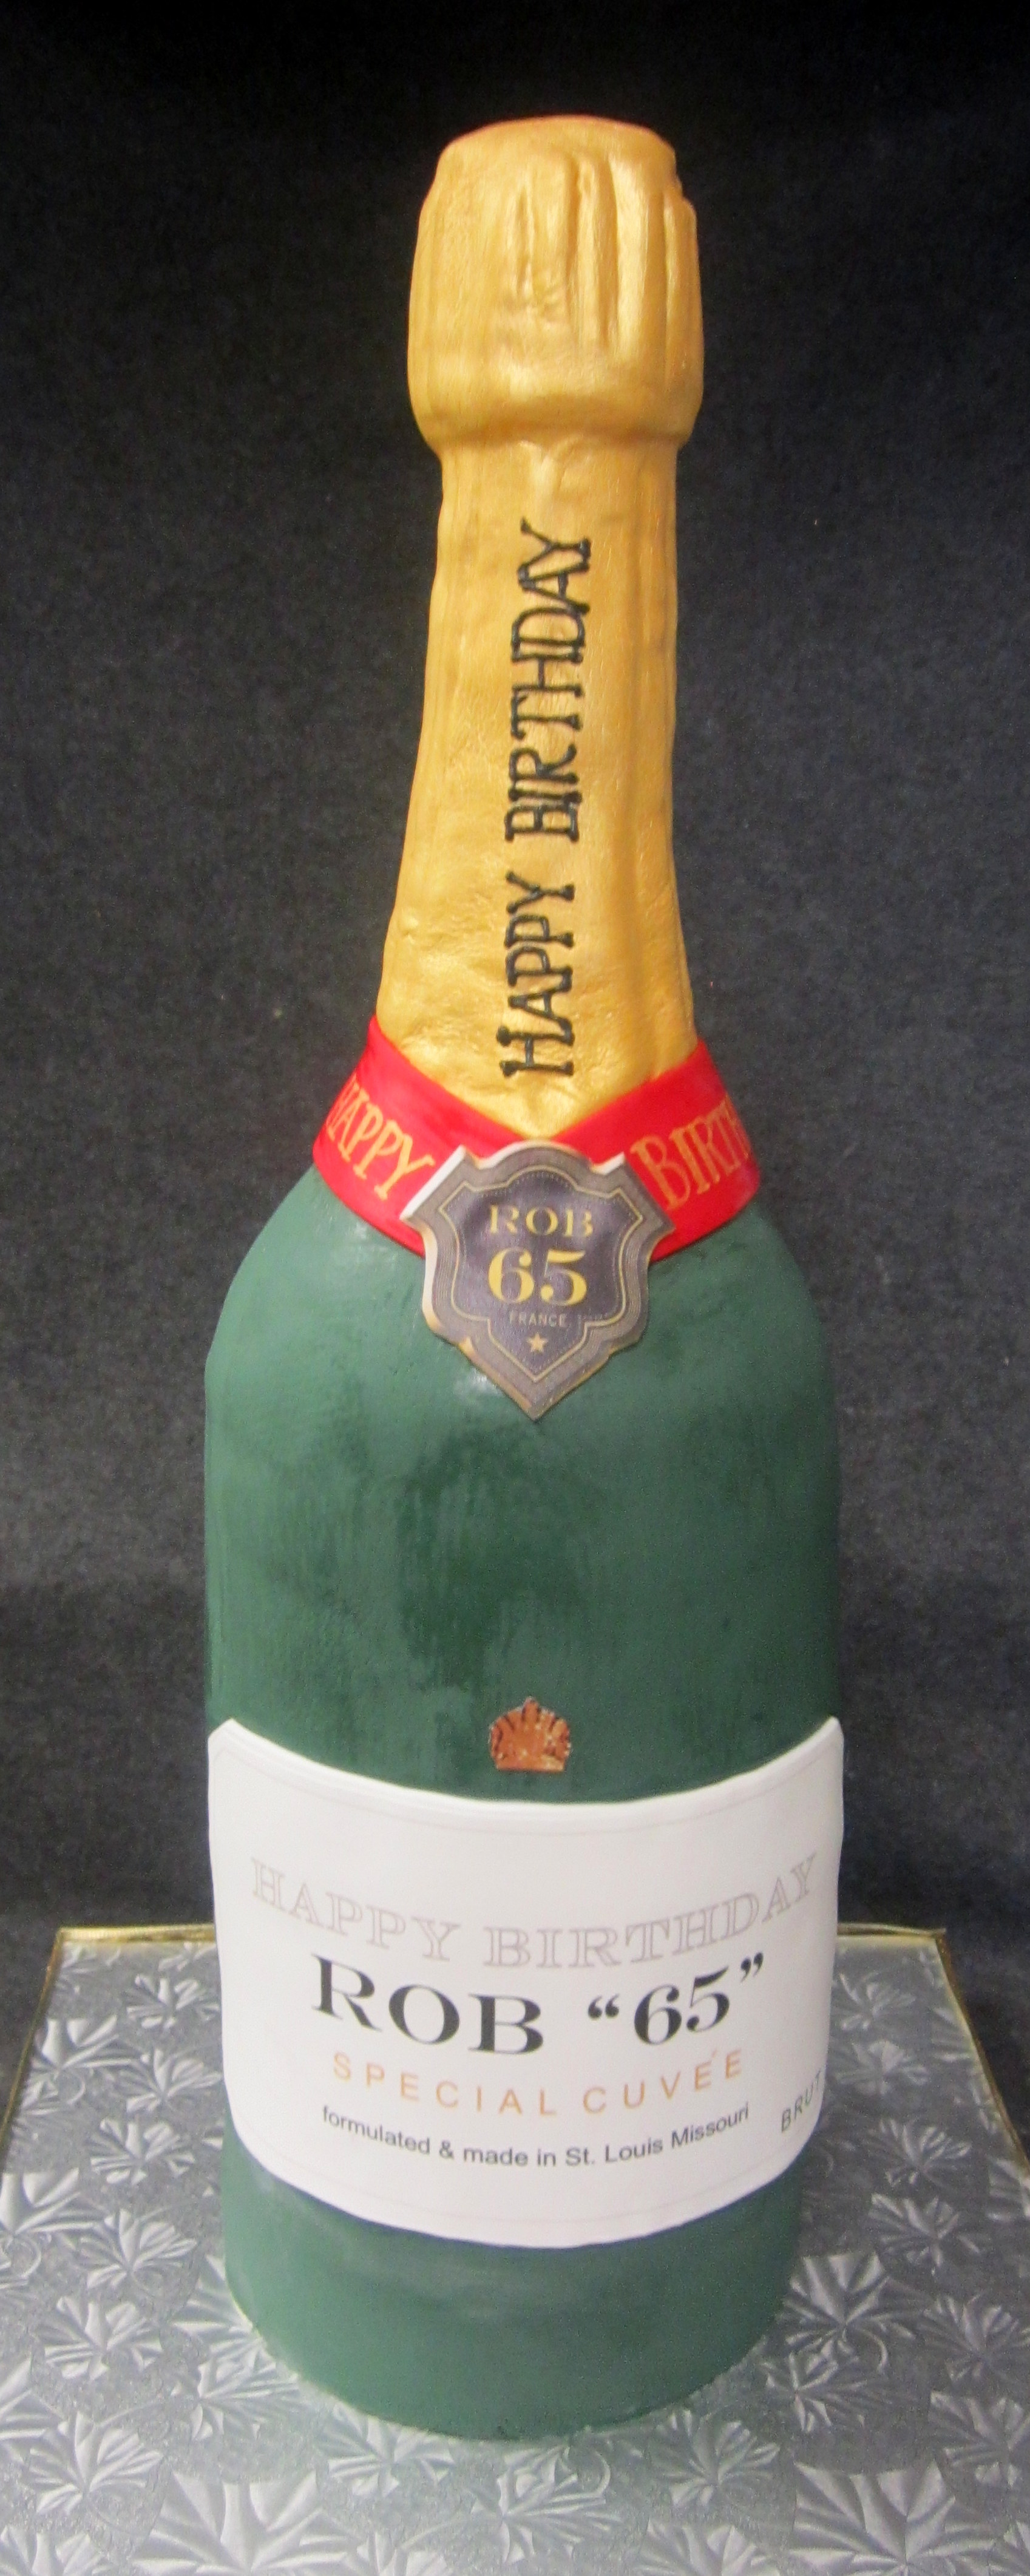 magnum champagne bottle.jpg